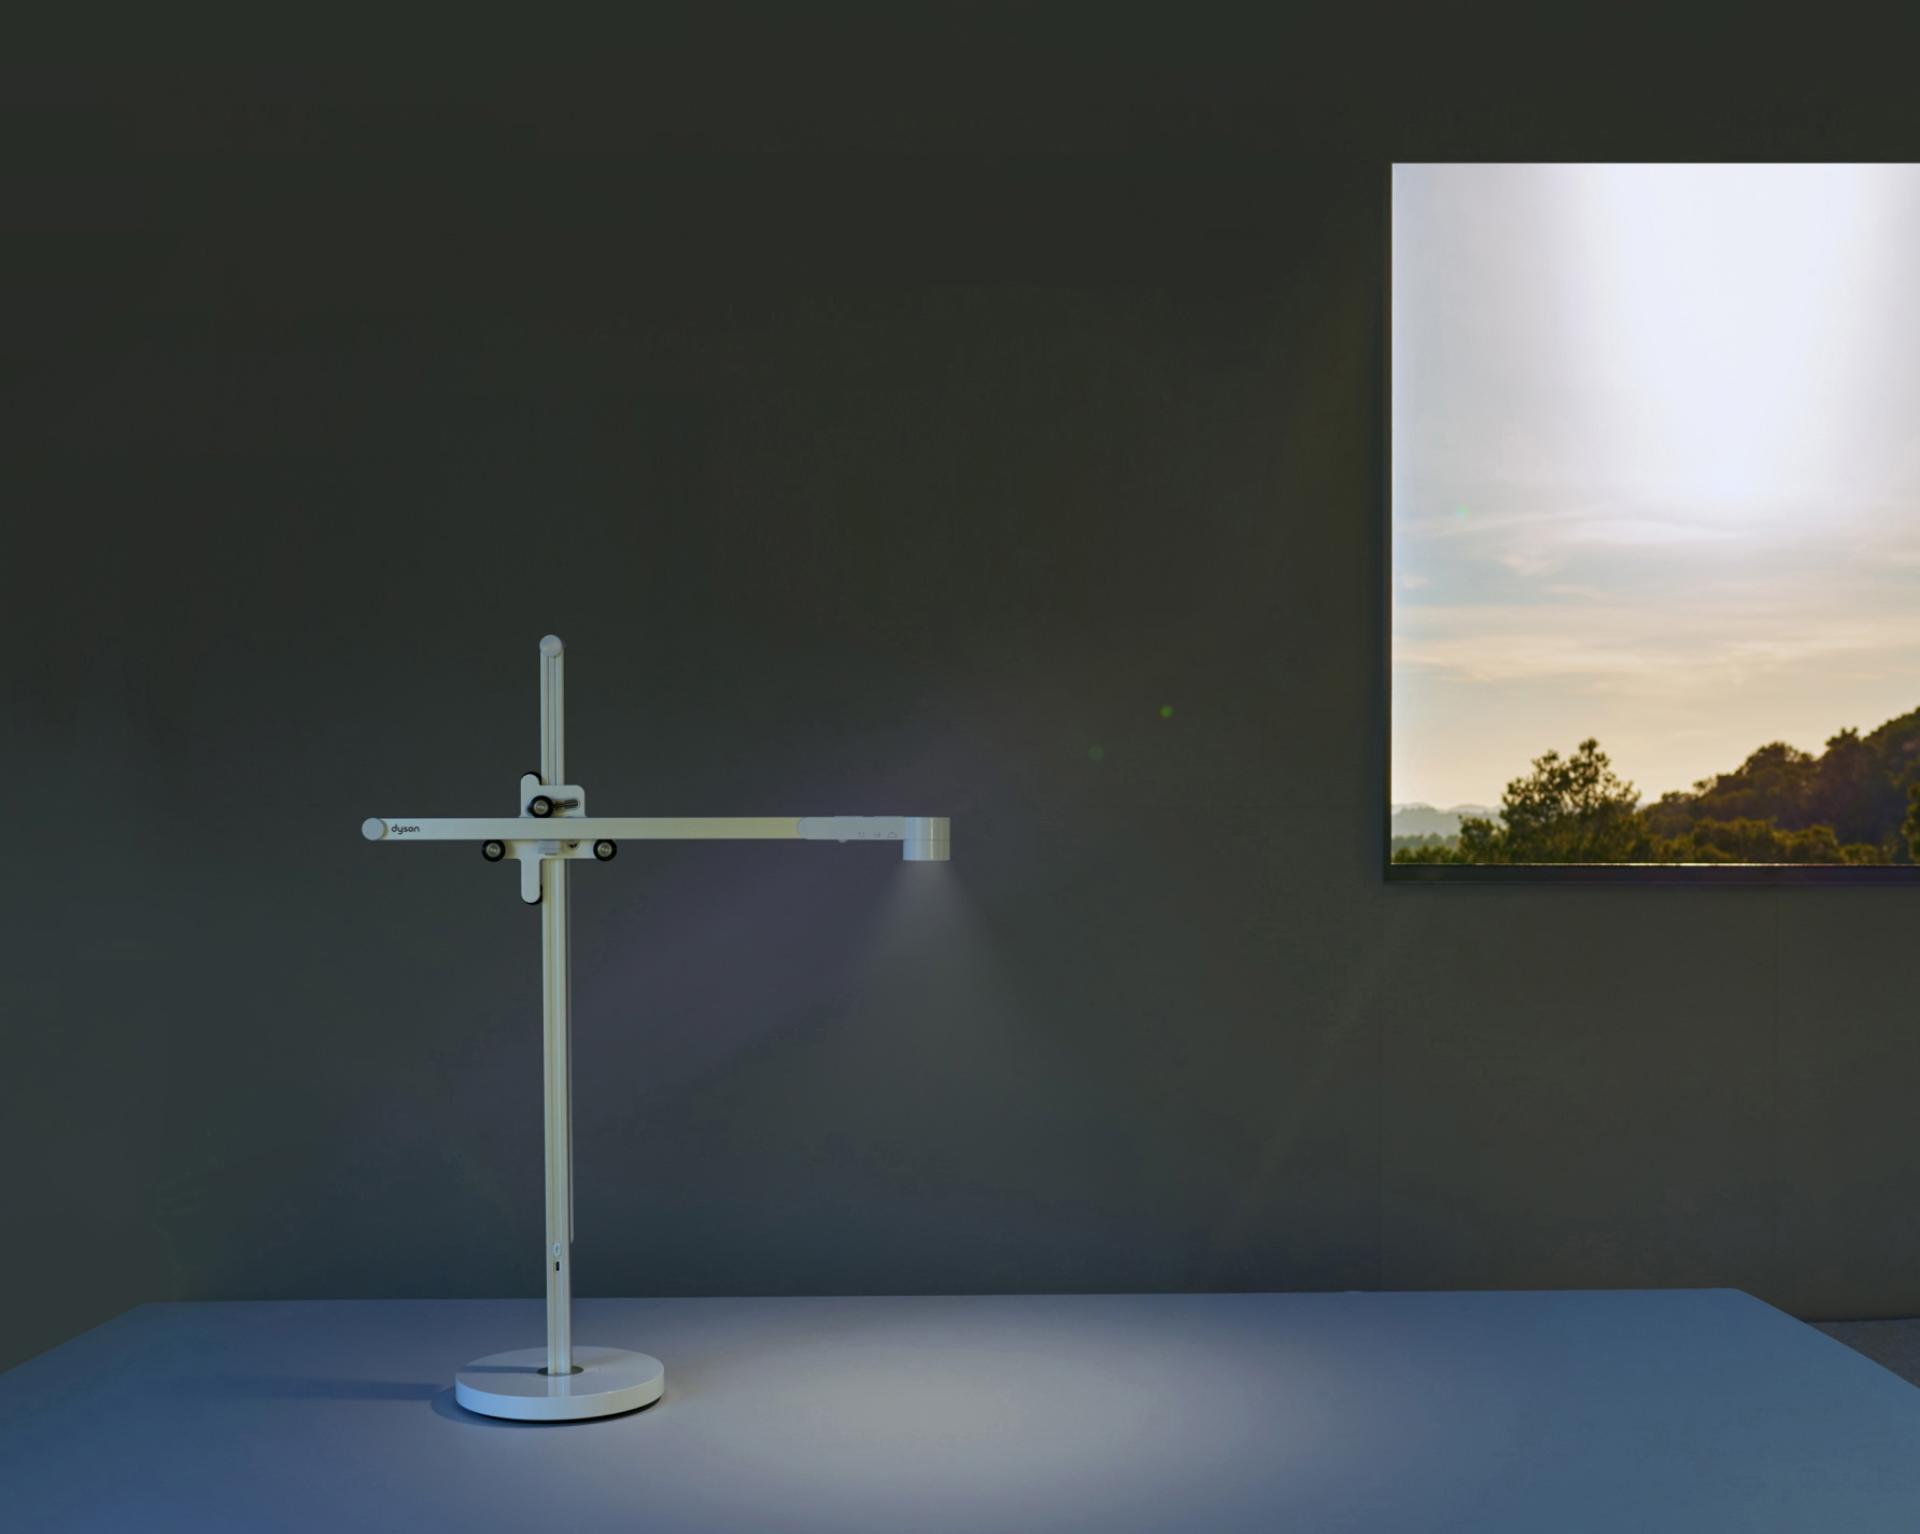 The Dyson Lightcycle? task light adjusting with daylight outside a window